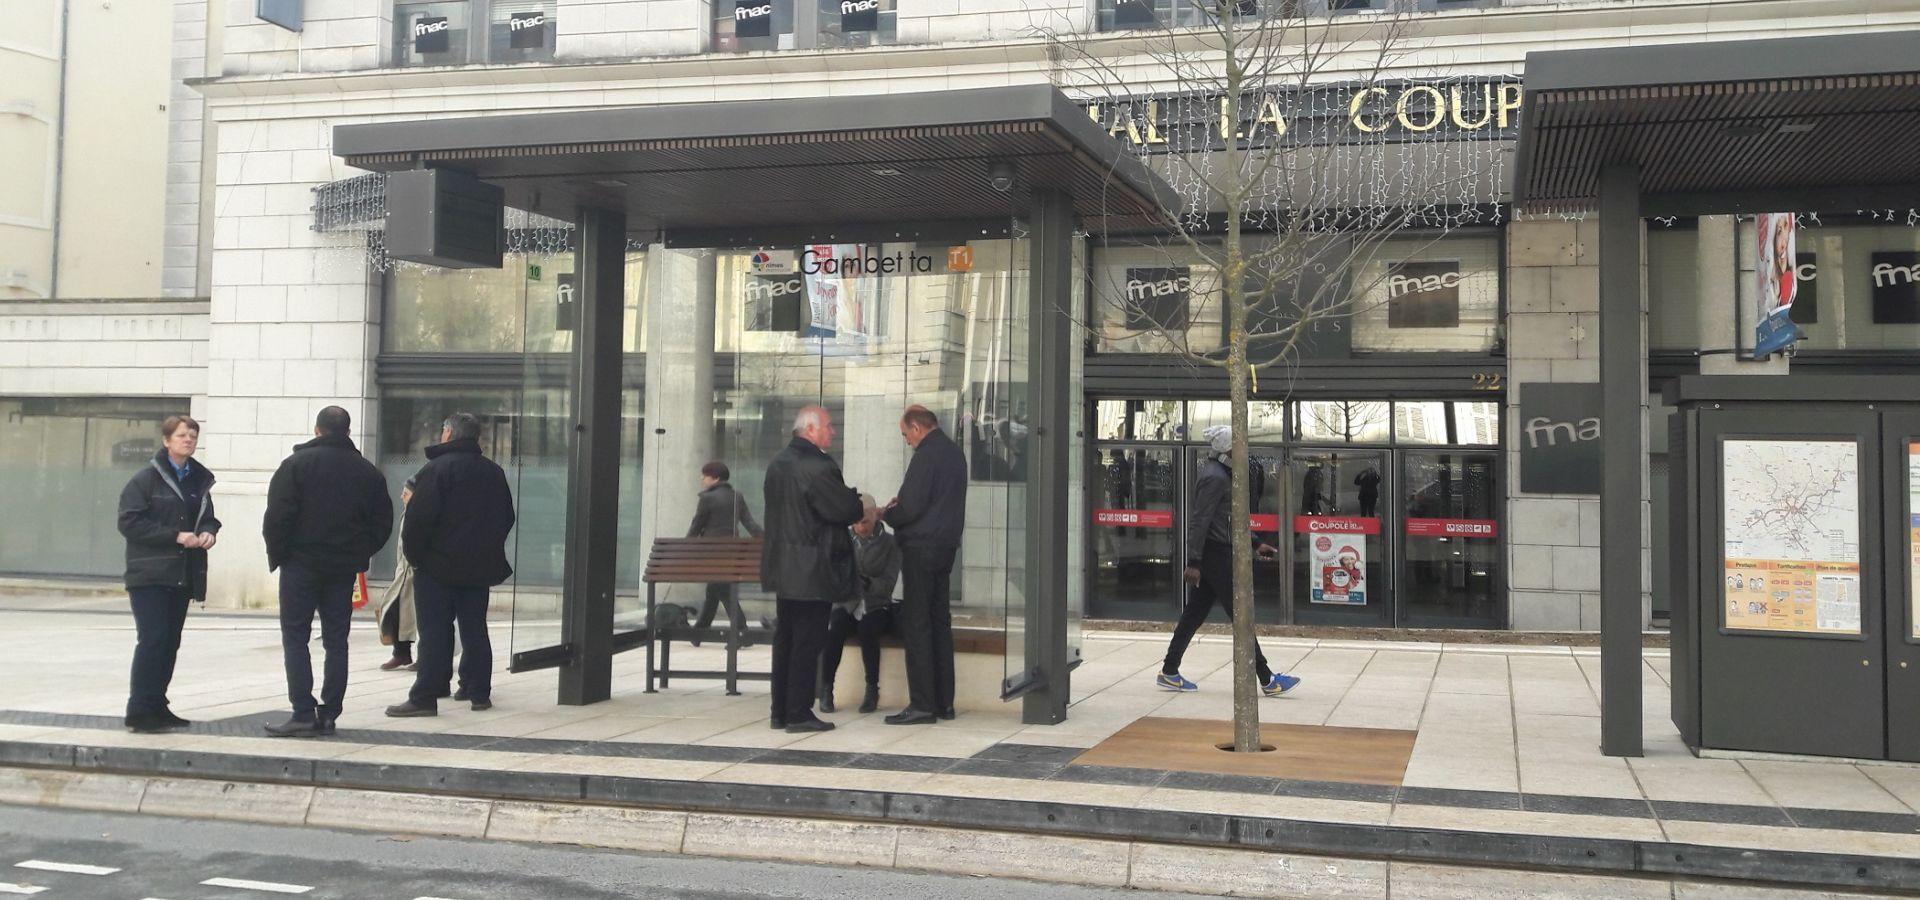 BHNS NIMES Abris voyageurs metalco mobilconcepts